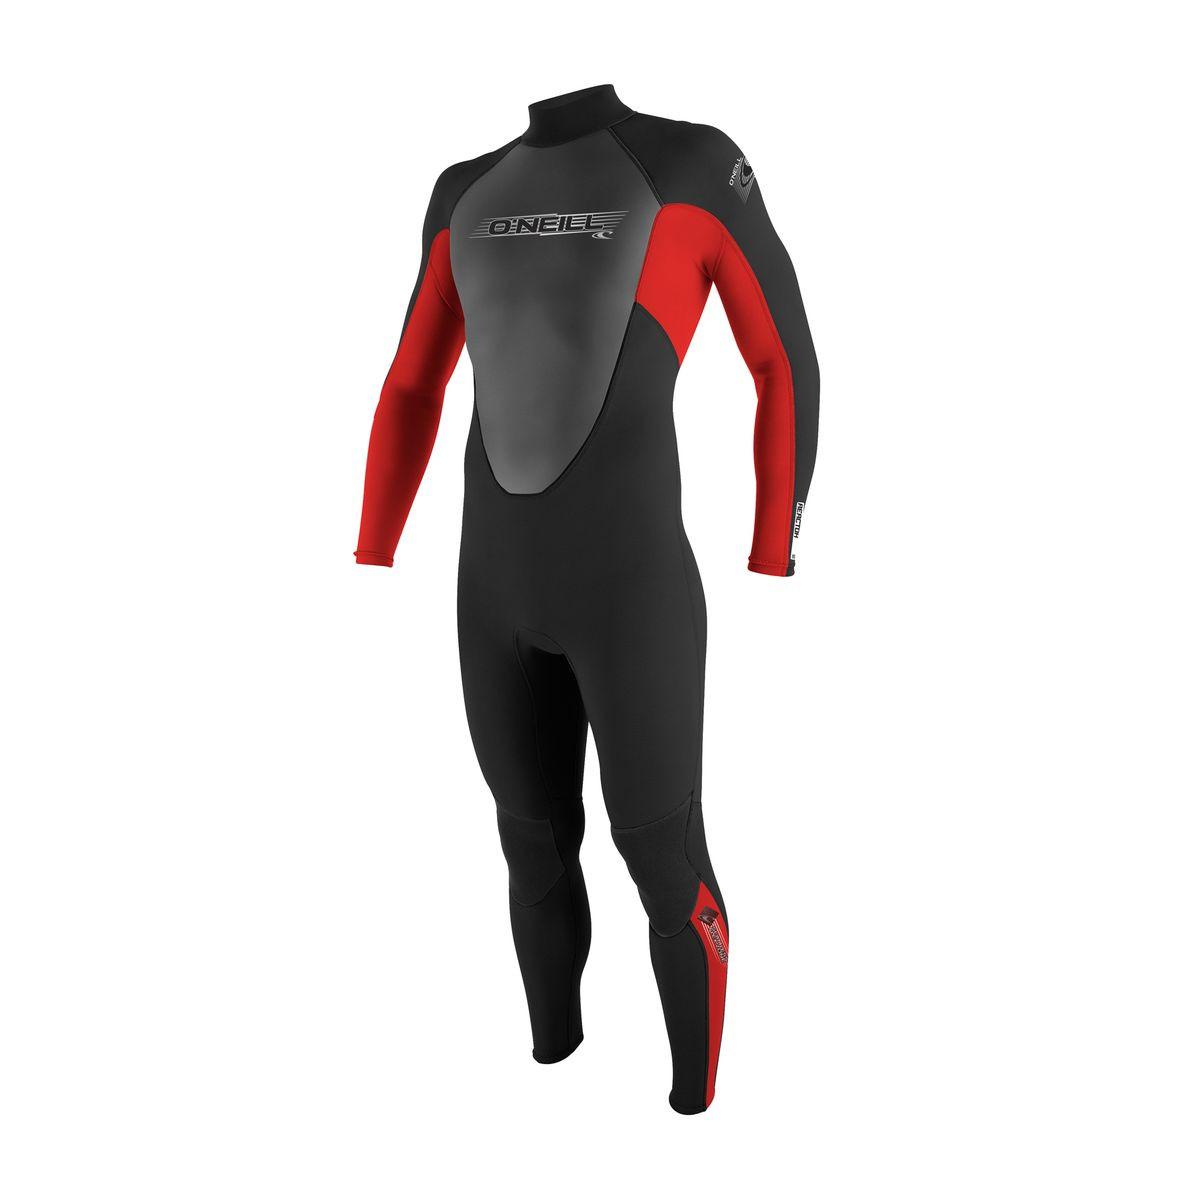 O'Neill Junior Reactor 3/2mm Back Zip Wetsuit - Black/Red/Graphite